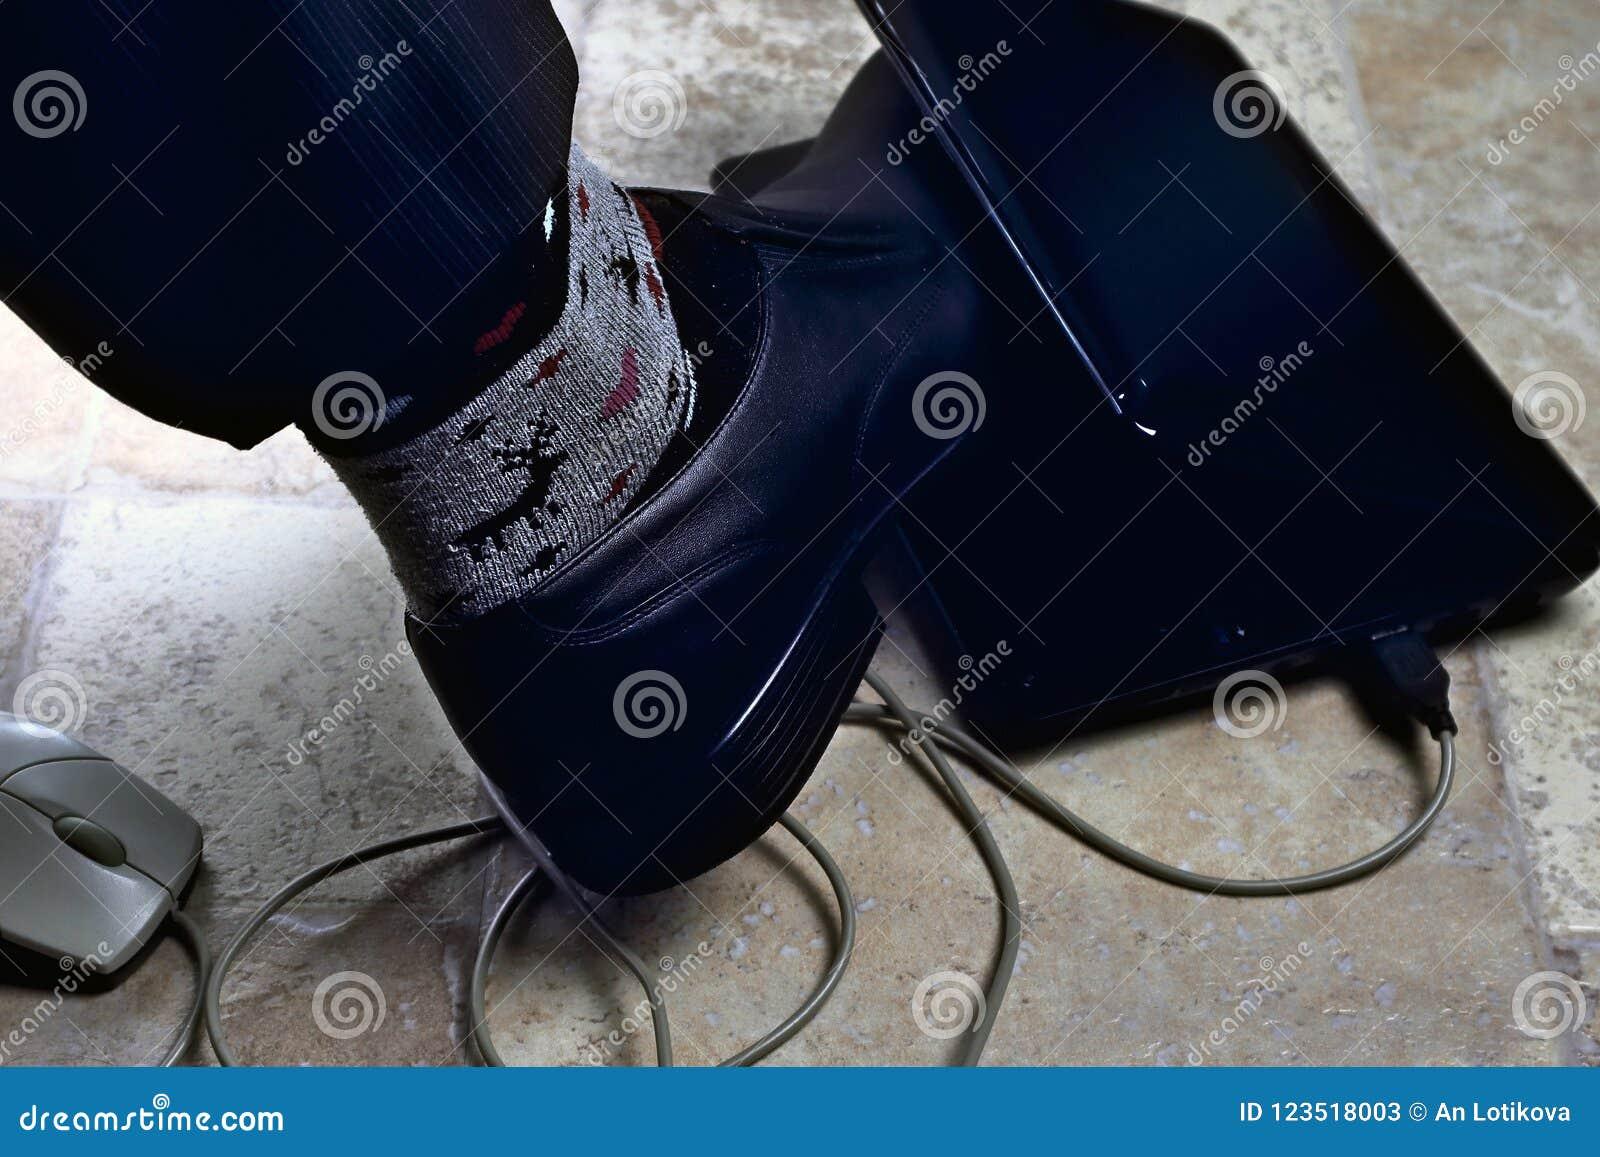 Office clerk`s foot is clamped in netbook as in trap, overwork, work seven days a week